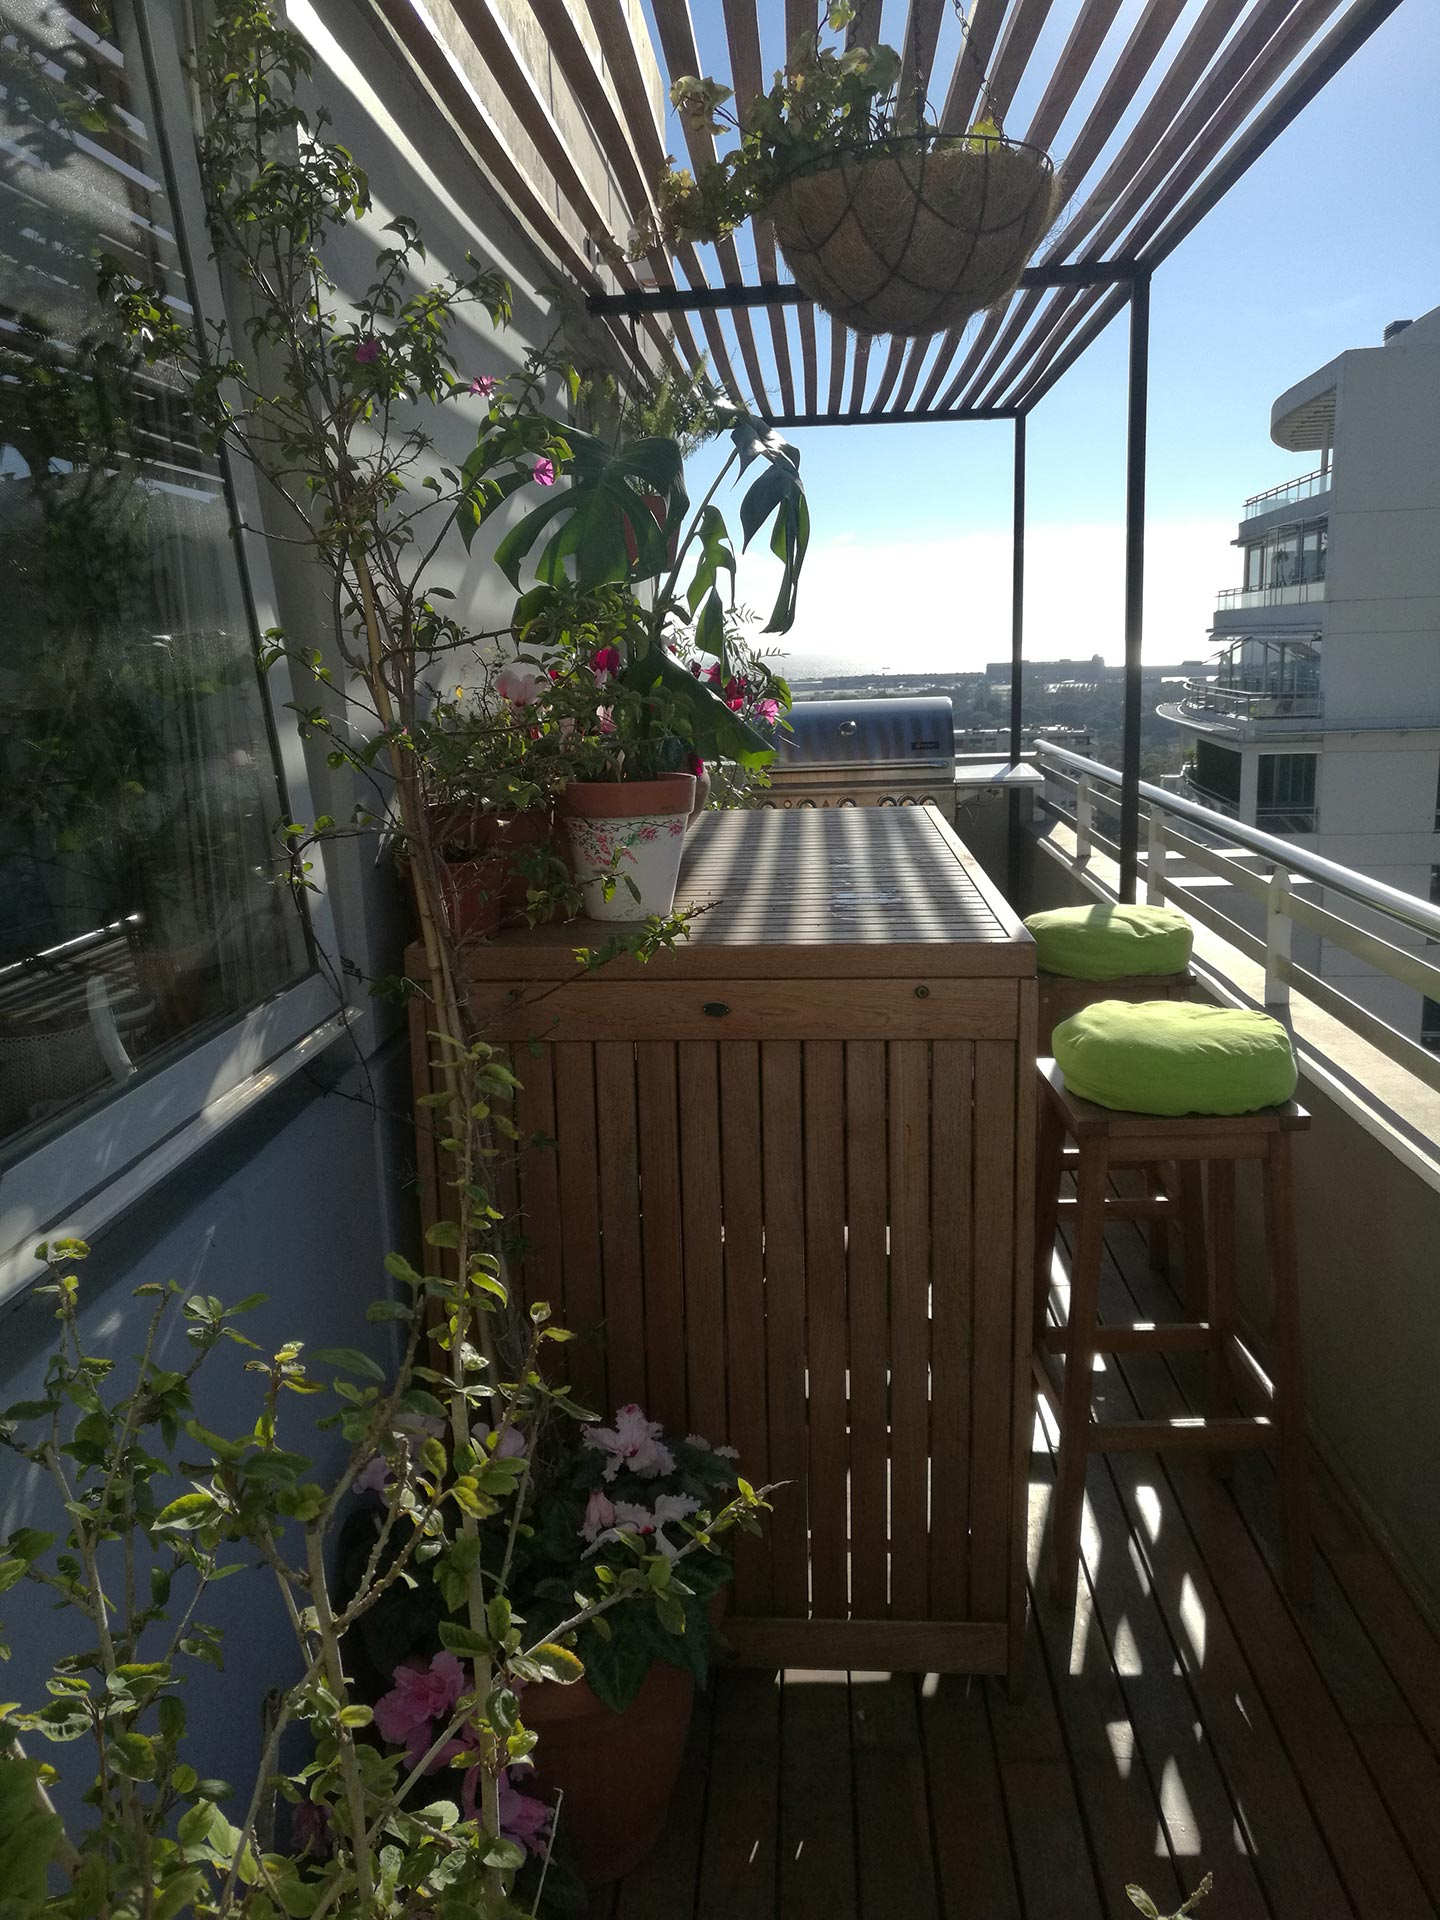 Sadhana Garden Arte Vida Plantas Materos Flores Matas Balcones Decoración Deco Art Decor Mantenimiento Buenos Aires BsAs Argentina Diseño Natural Nature Plants